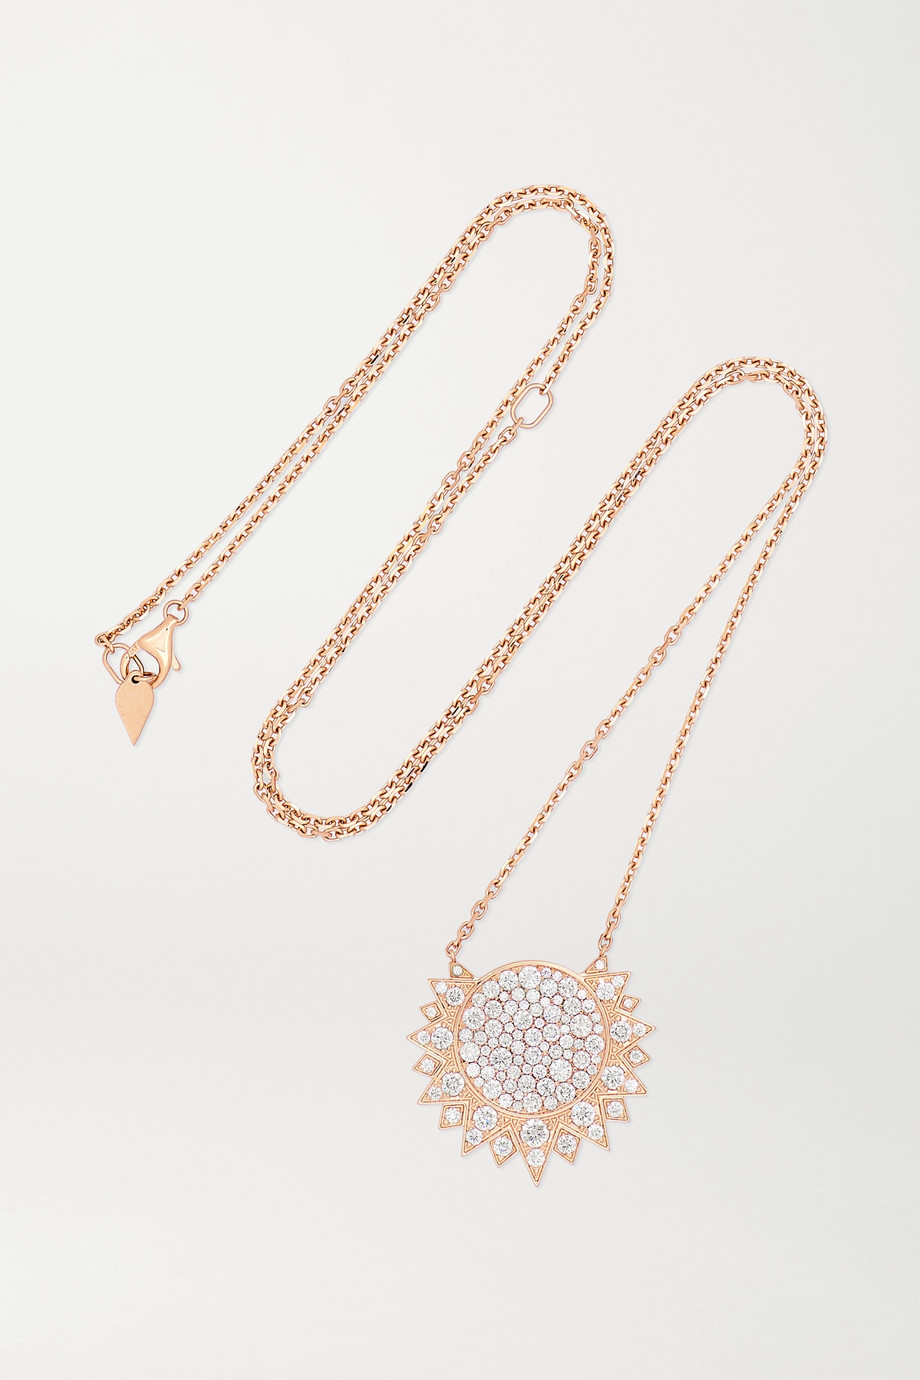 Piaget Sunlight 18K 玫瑰金钻石项链